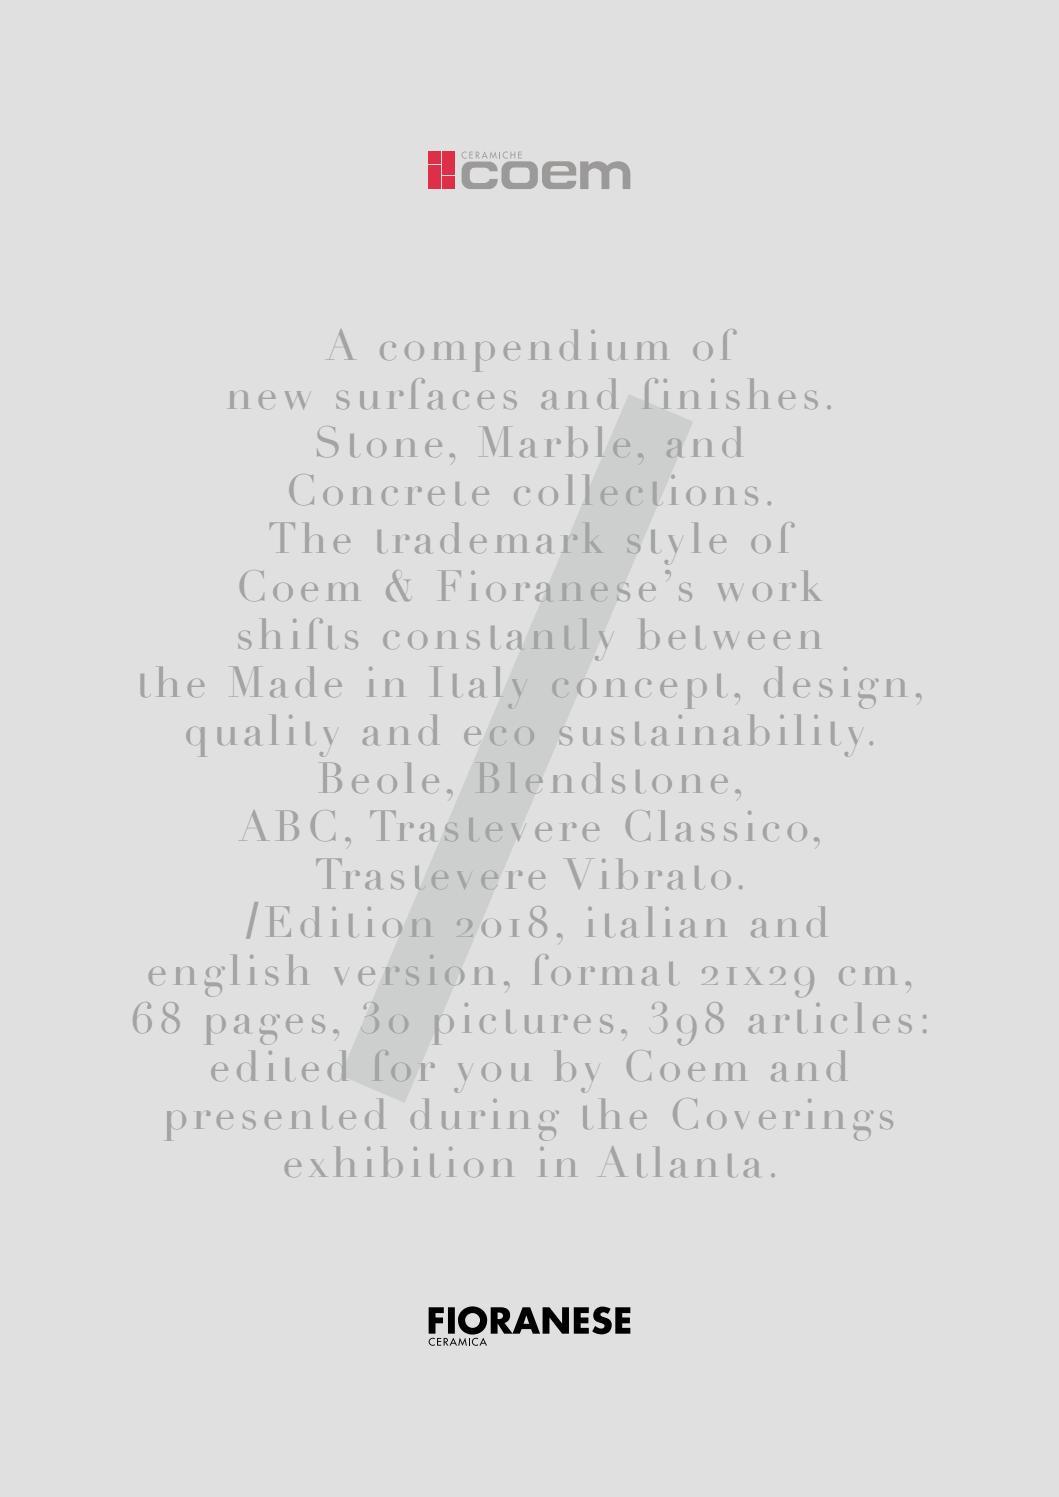 Coem Fioranese Coverings' 2018 by D-SEGNO STUDIO - issuu